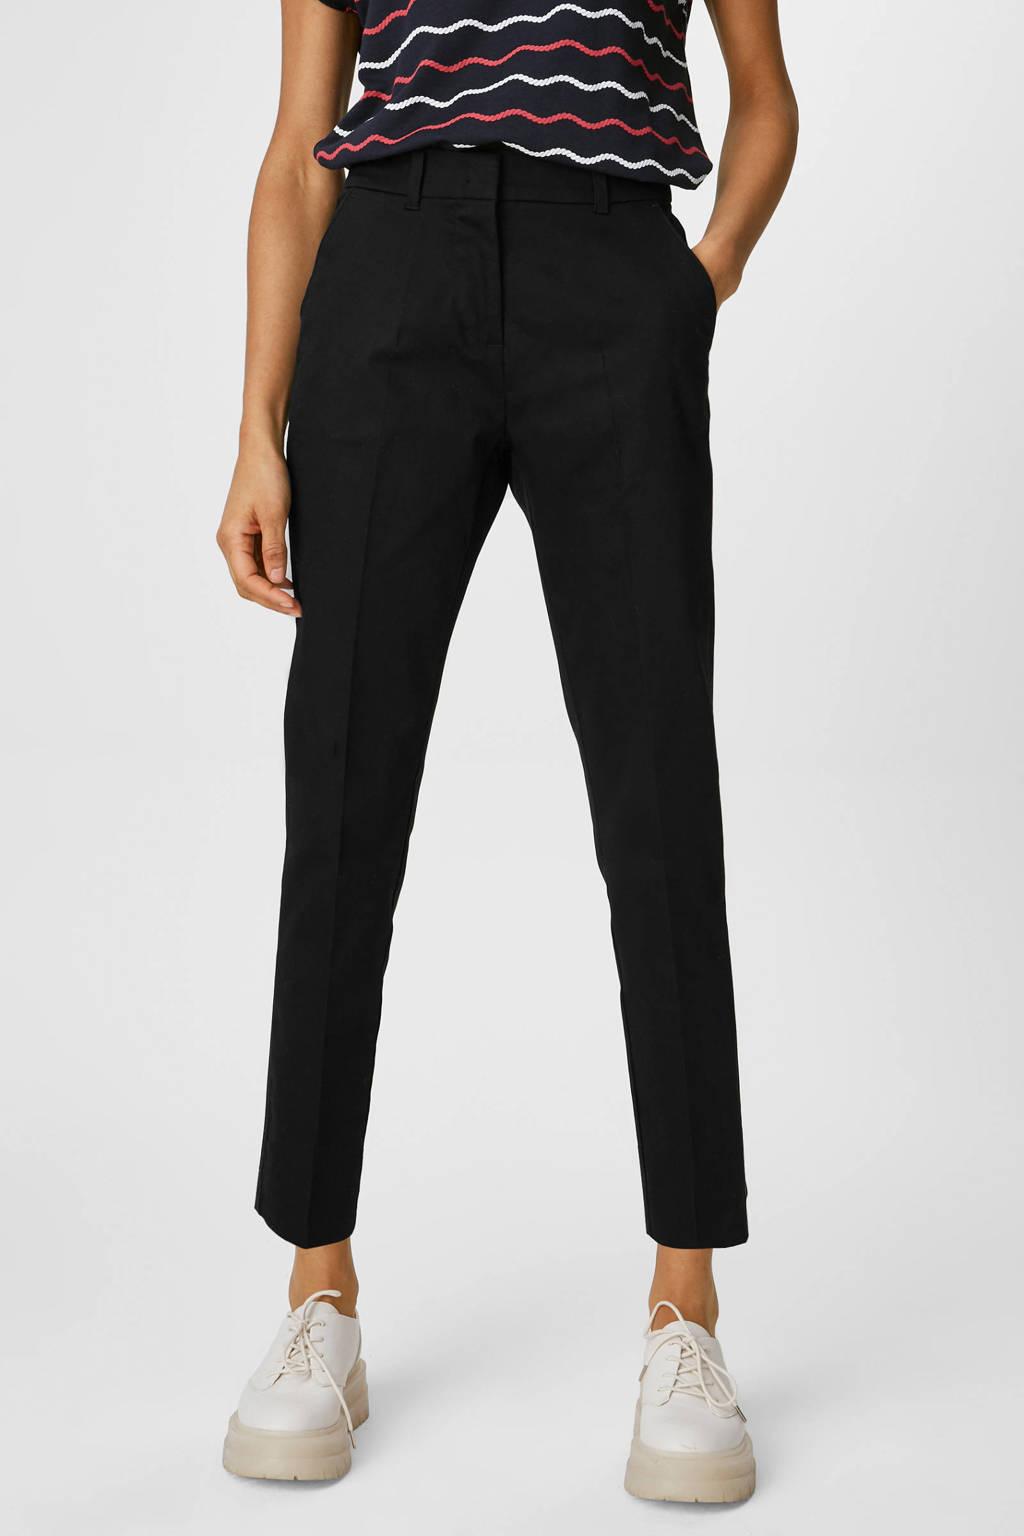 C&A Yessica straight fit broek zwart, Zwart